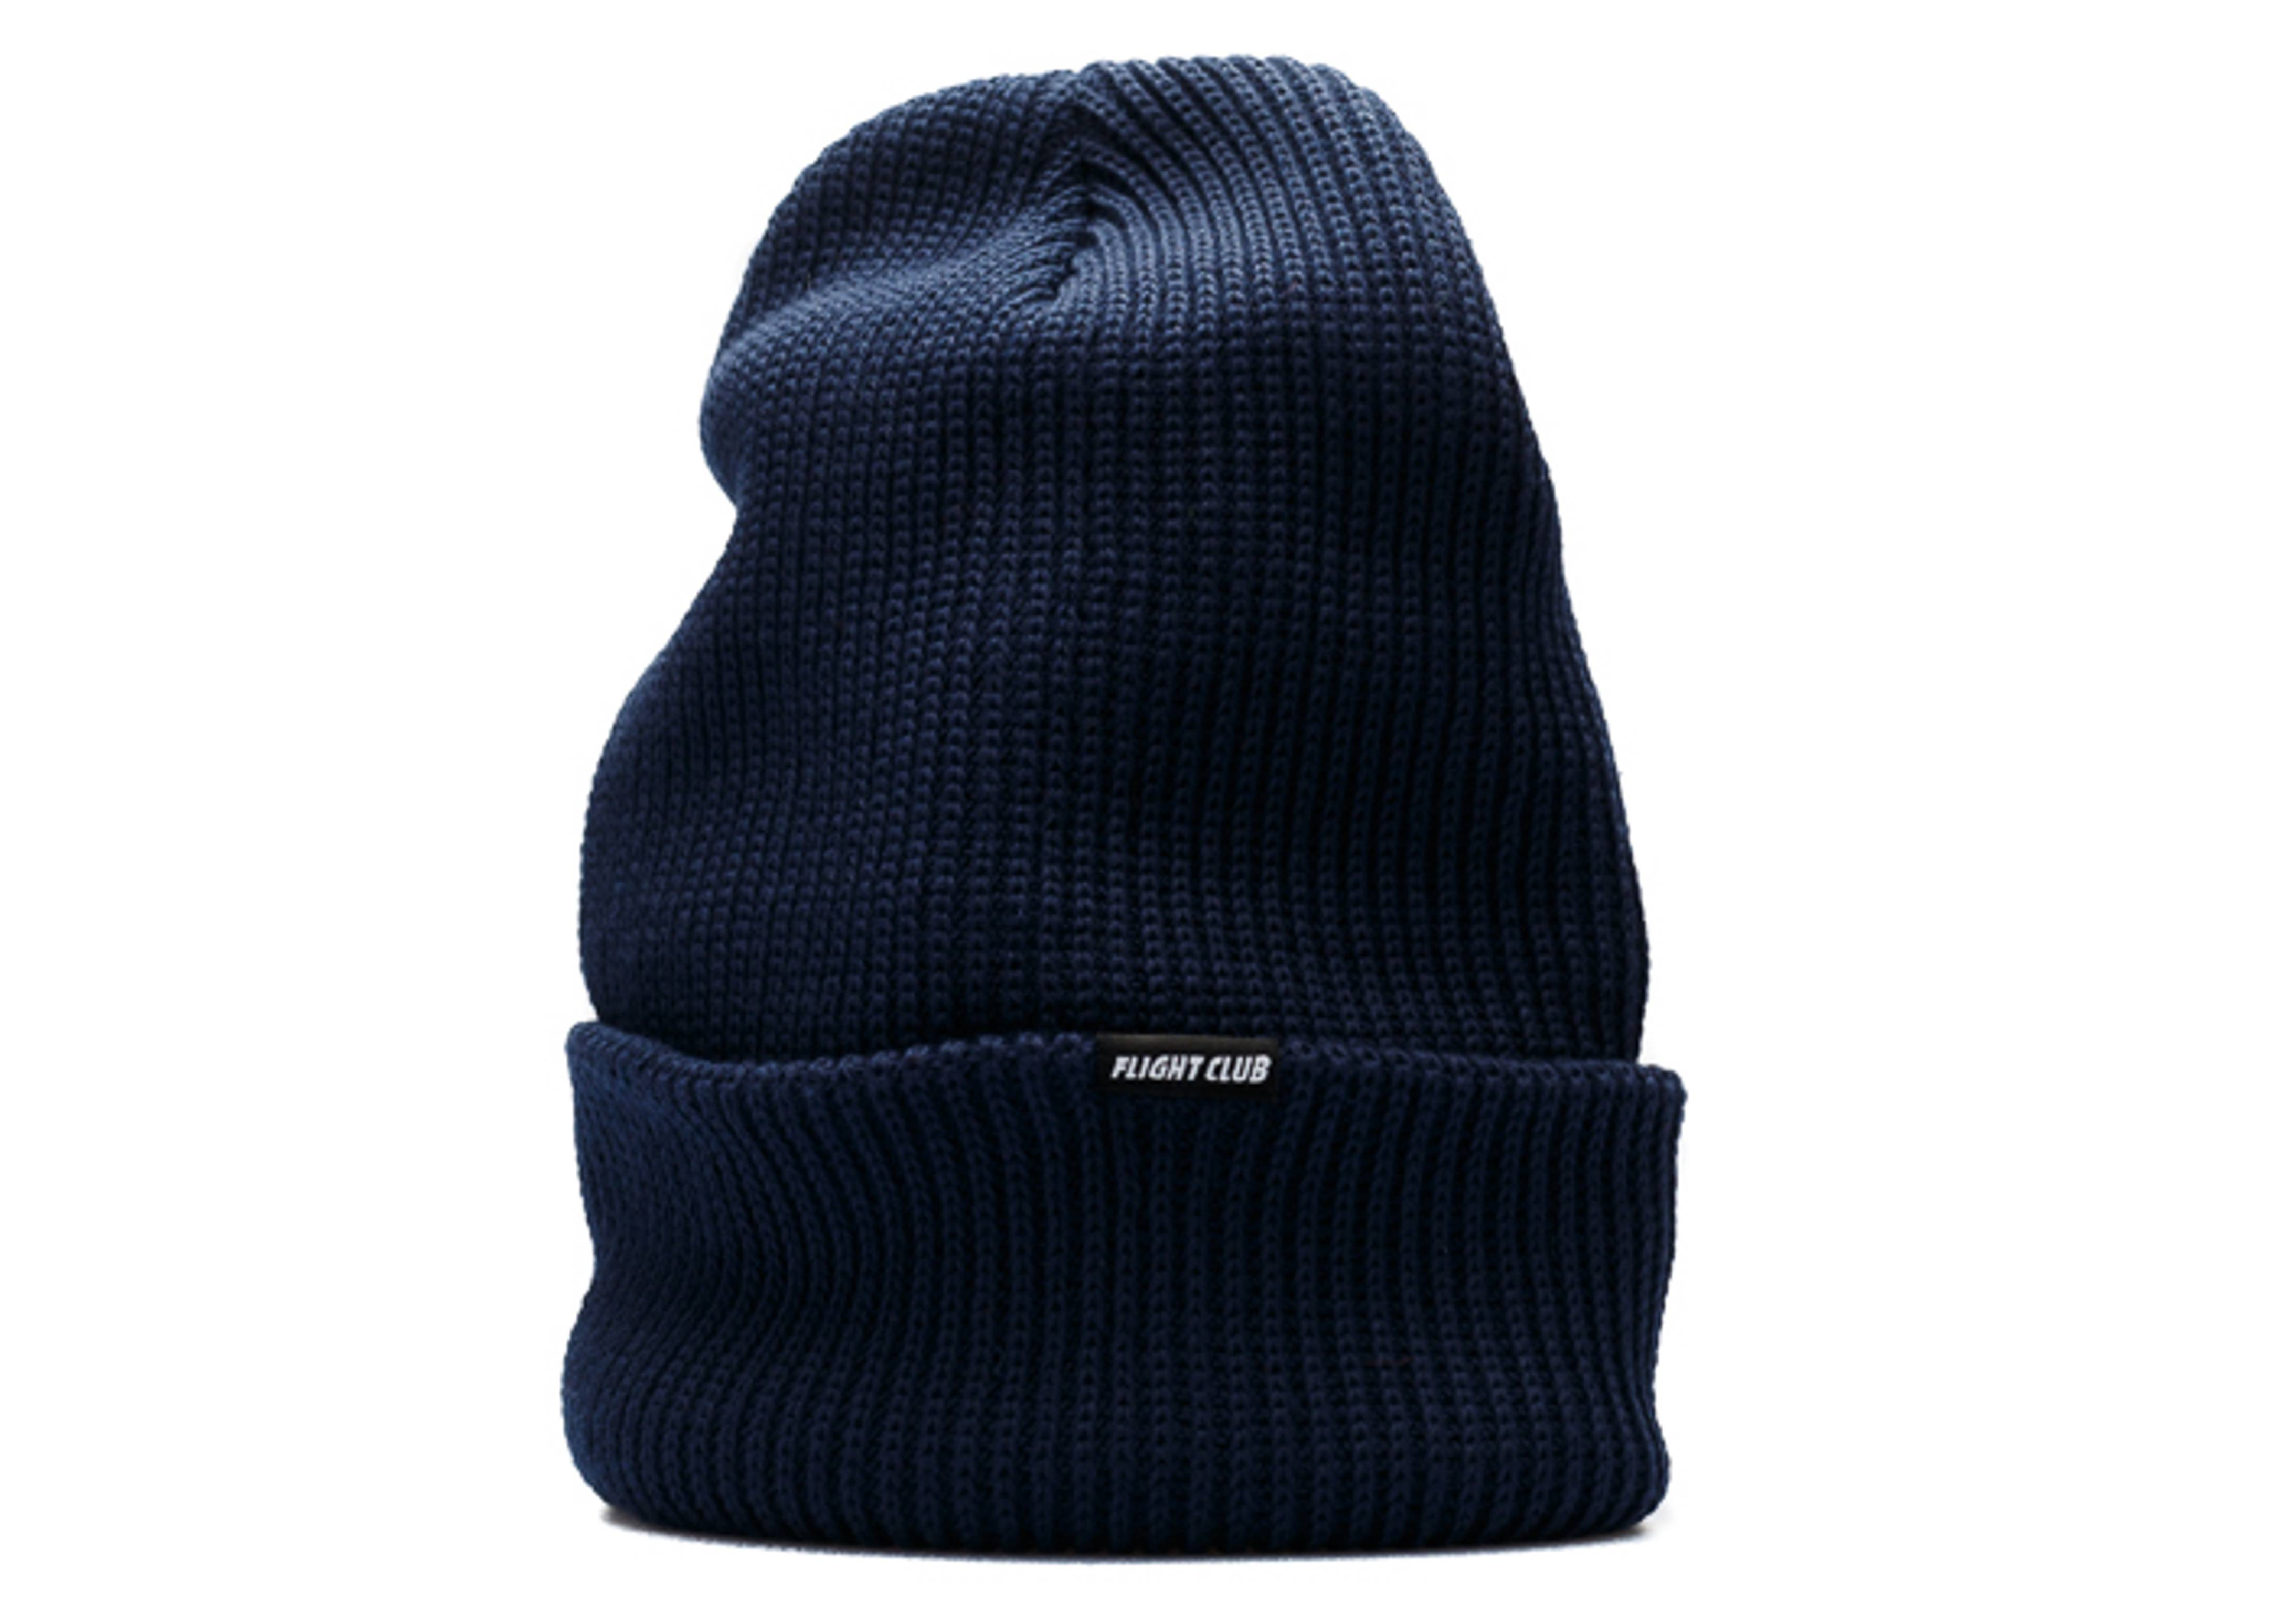 black tab cuffed knit beanie